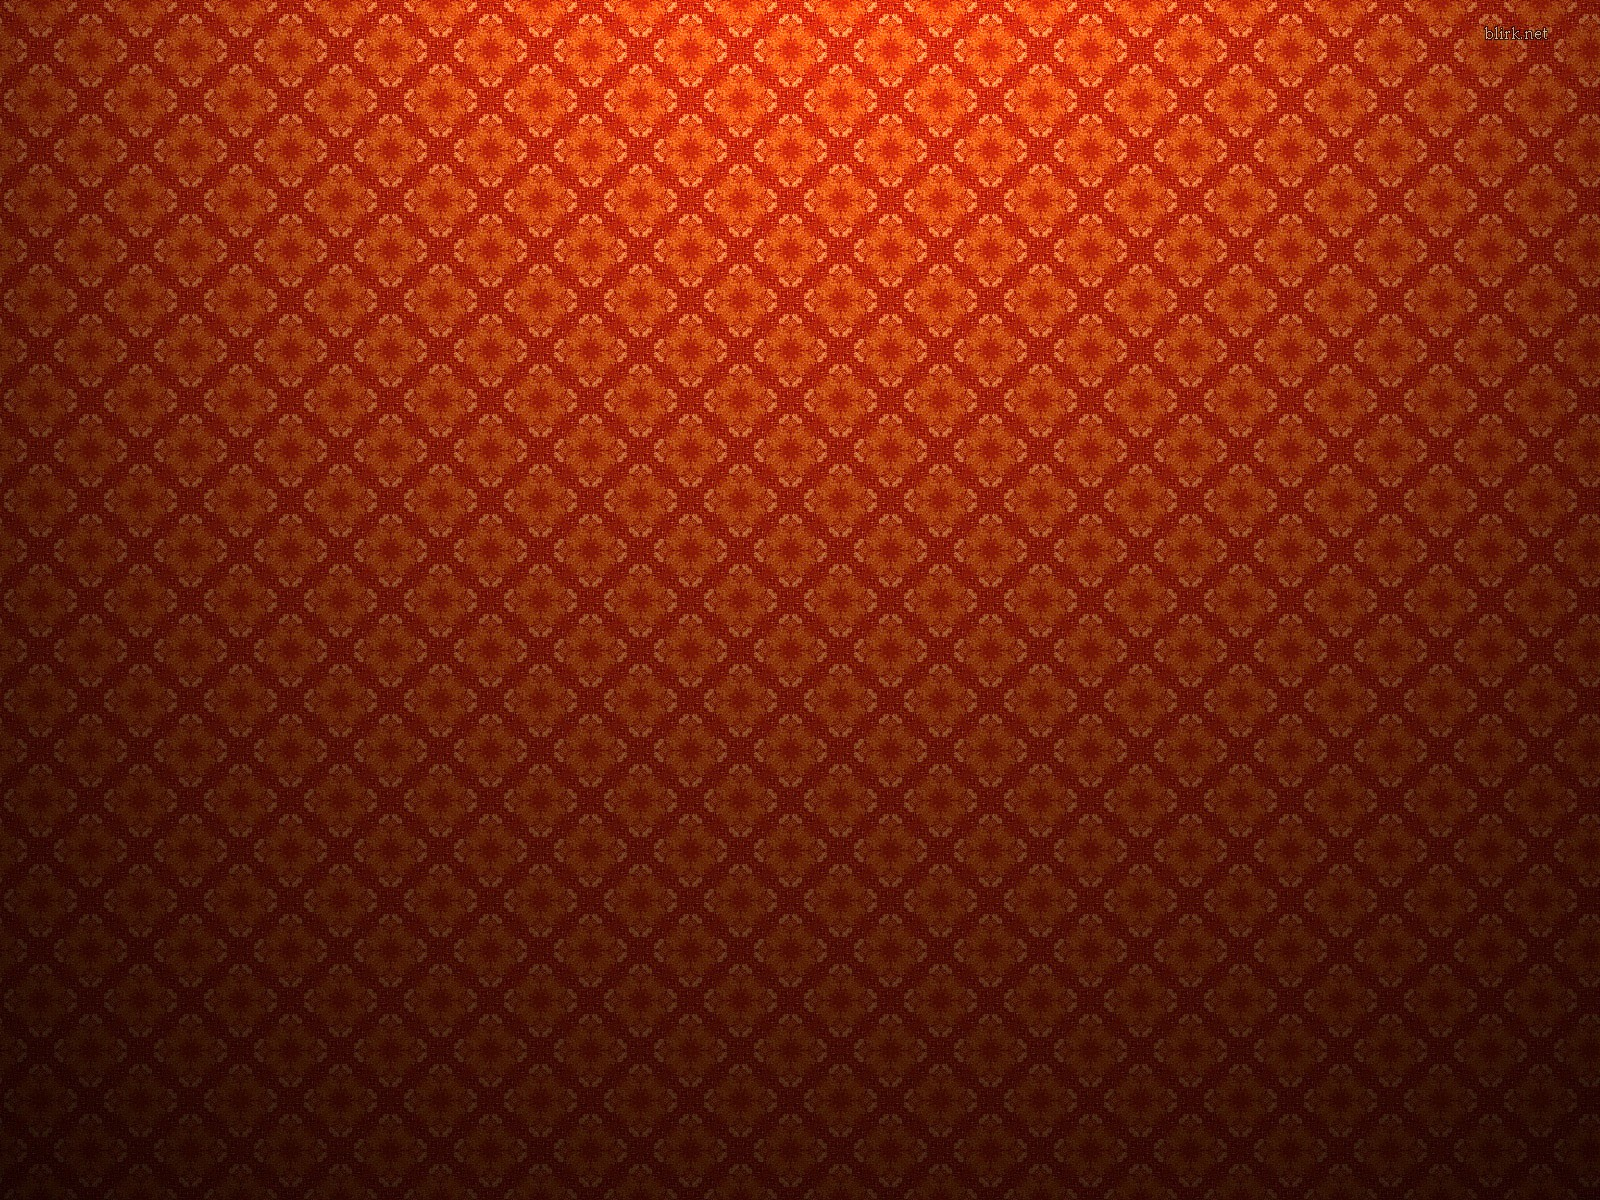 Wallpaper textures wallpapersafari for Texture wallpaper for walls